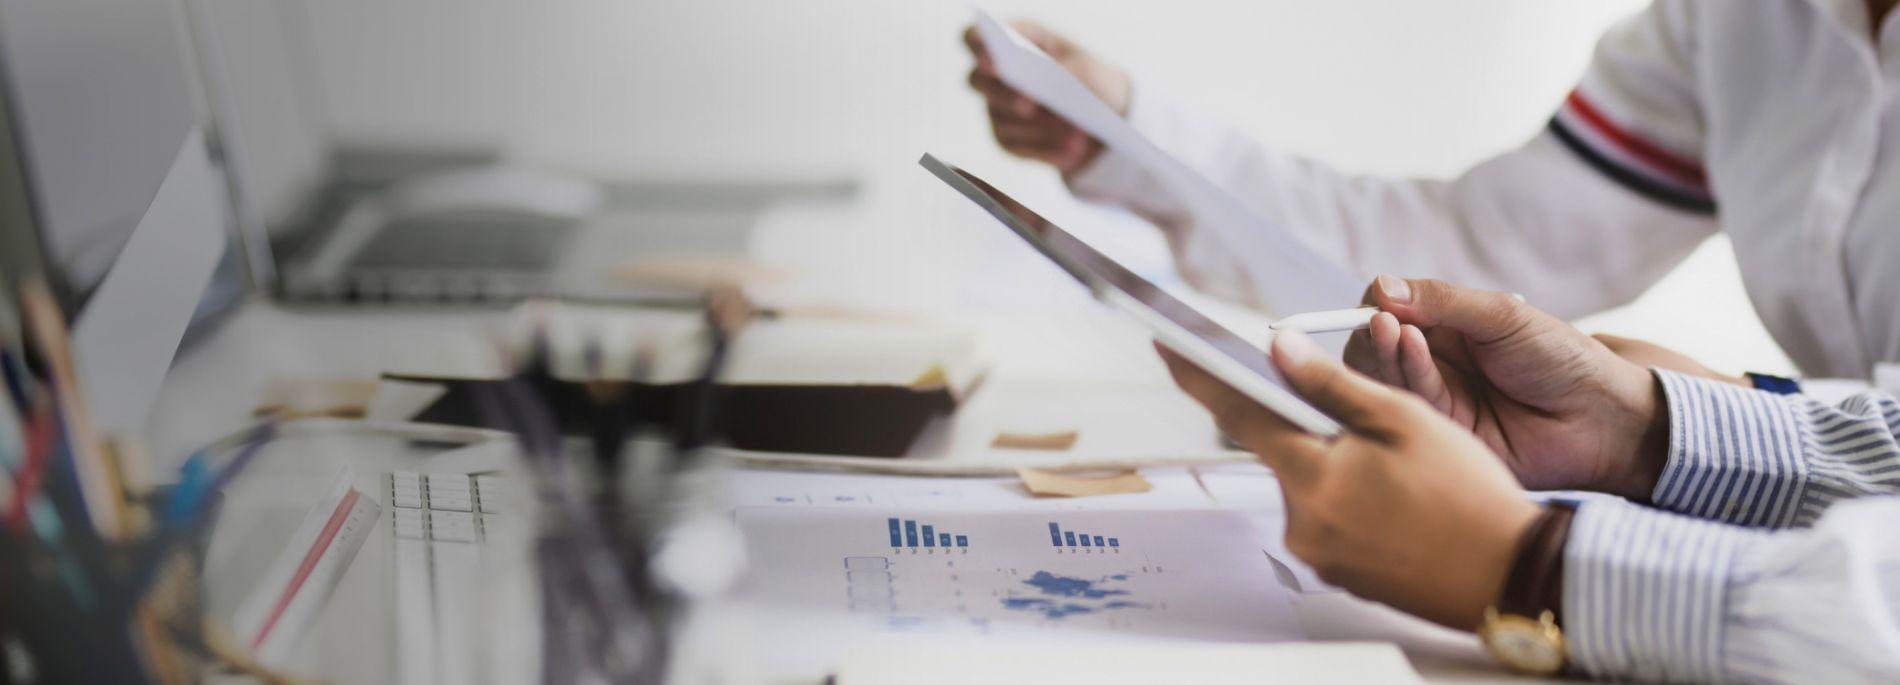 Кредит без поручителей для ИП на бизнес